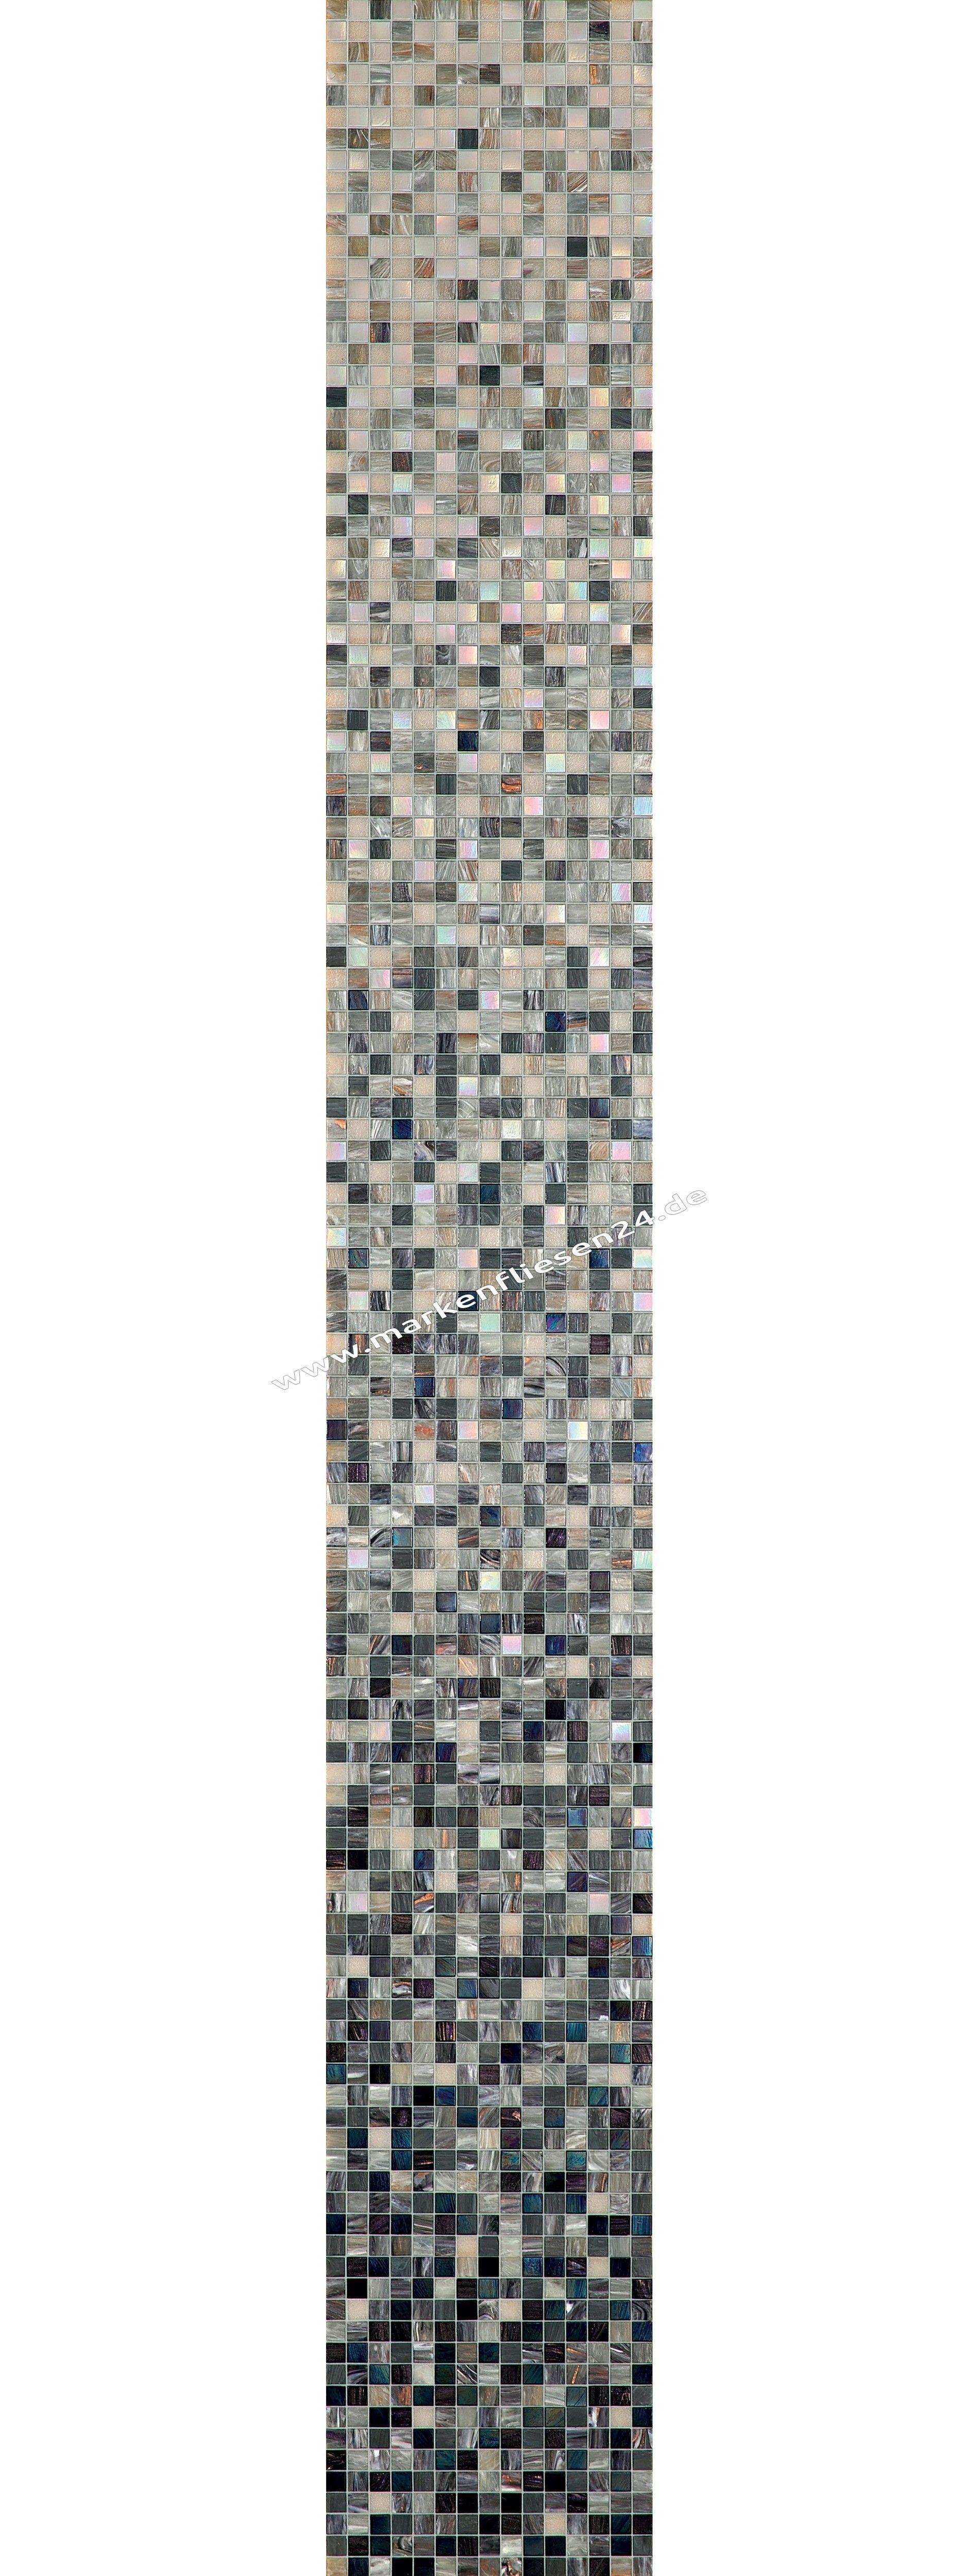 Bisazza glasmosaik sfumature verlauf stella alpina - Fliesenforum karlsruhe ...